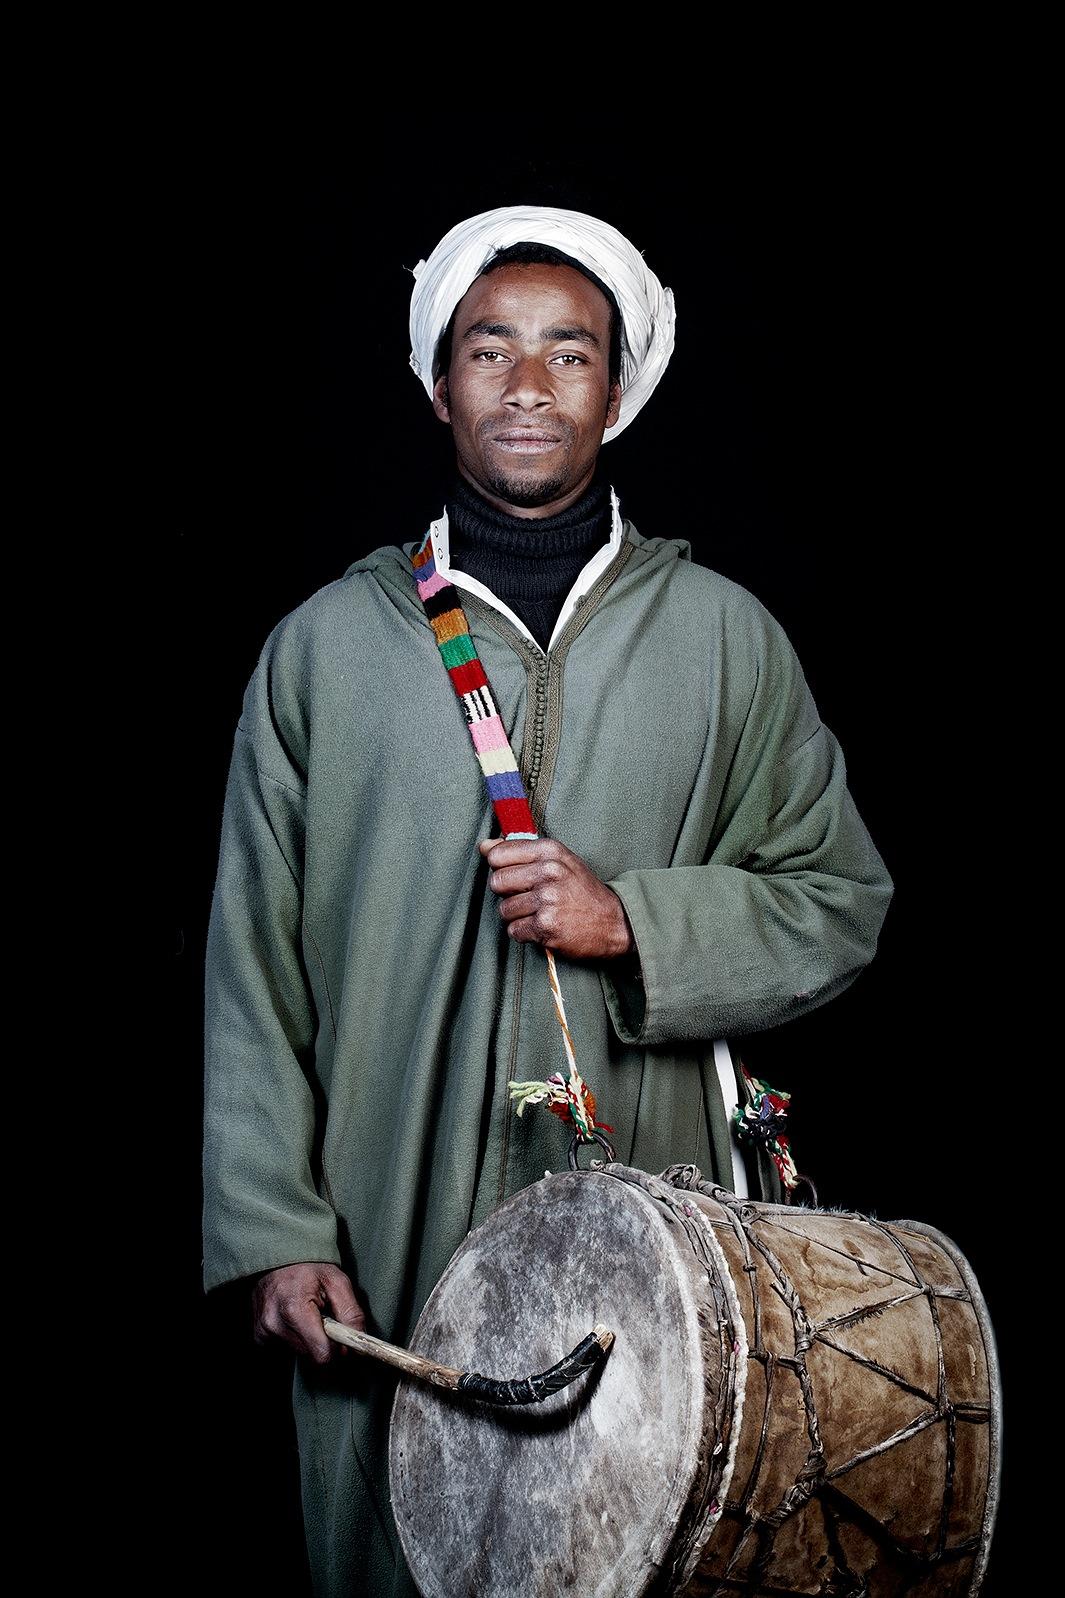 Марокканцы - портреты от Лейлы Алауи-11